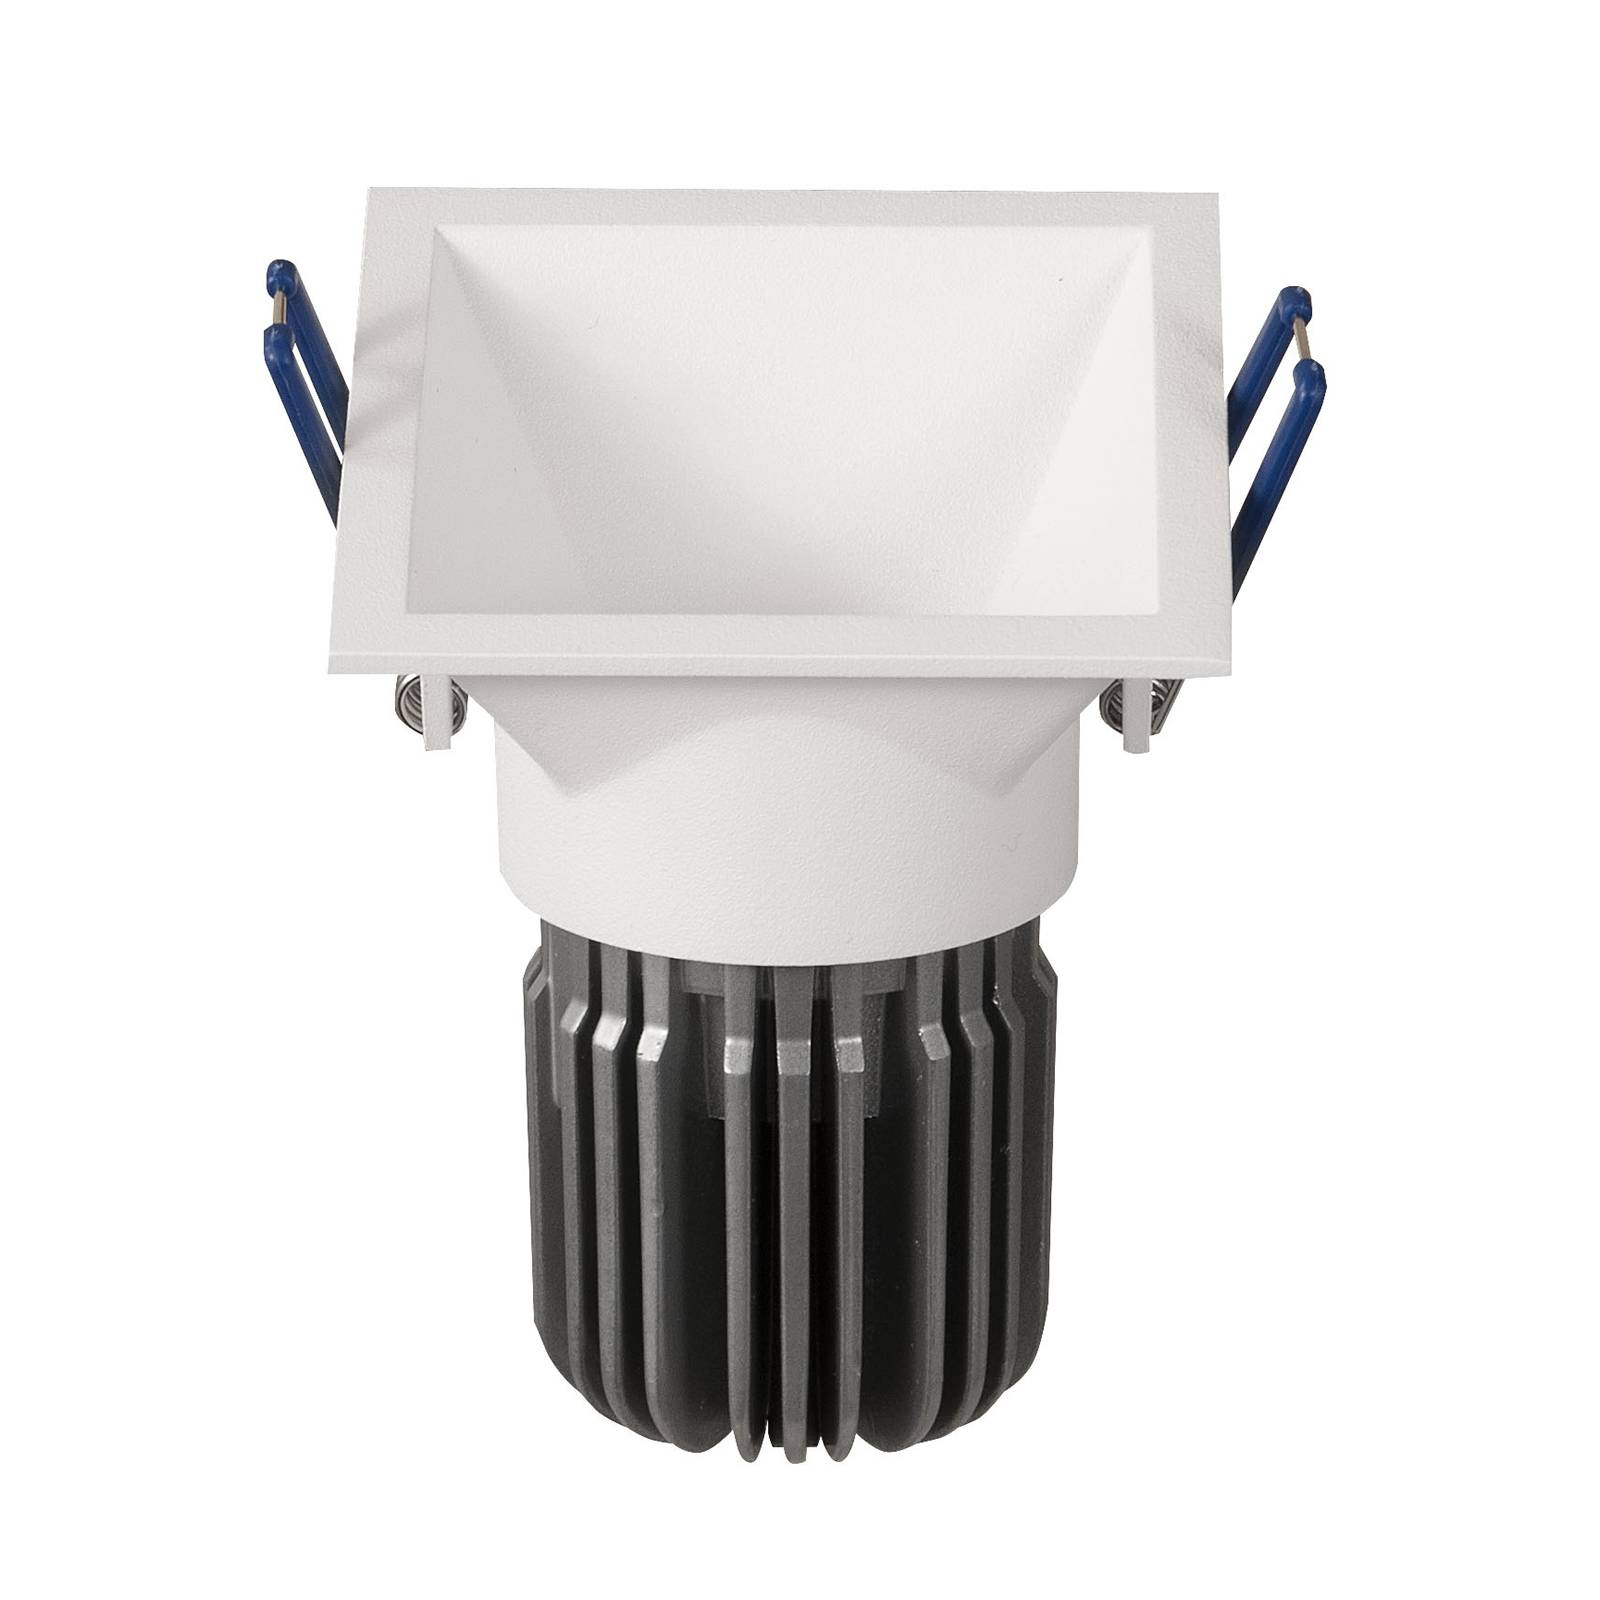 LED inbouwspot Toodle hoekig asymmetrisch, wit